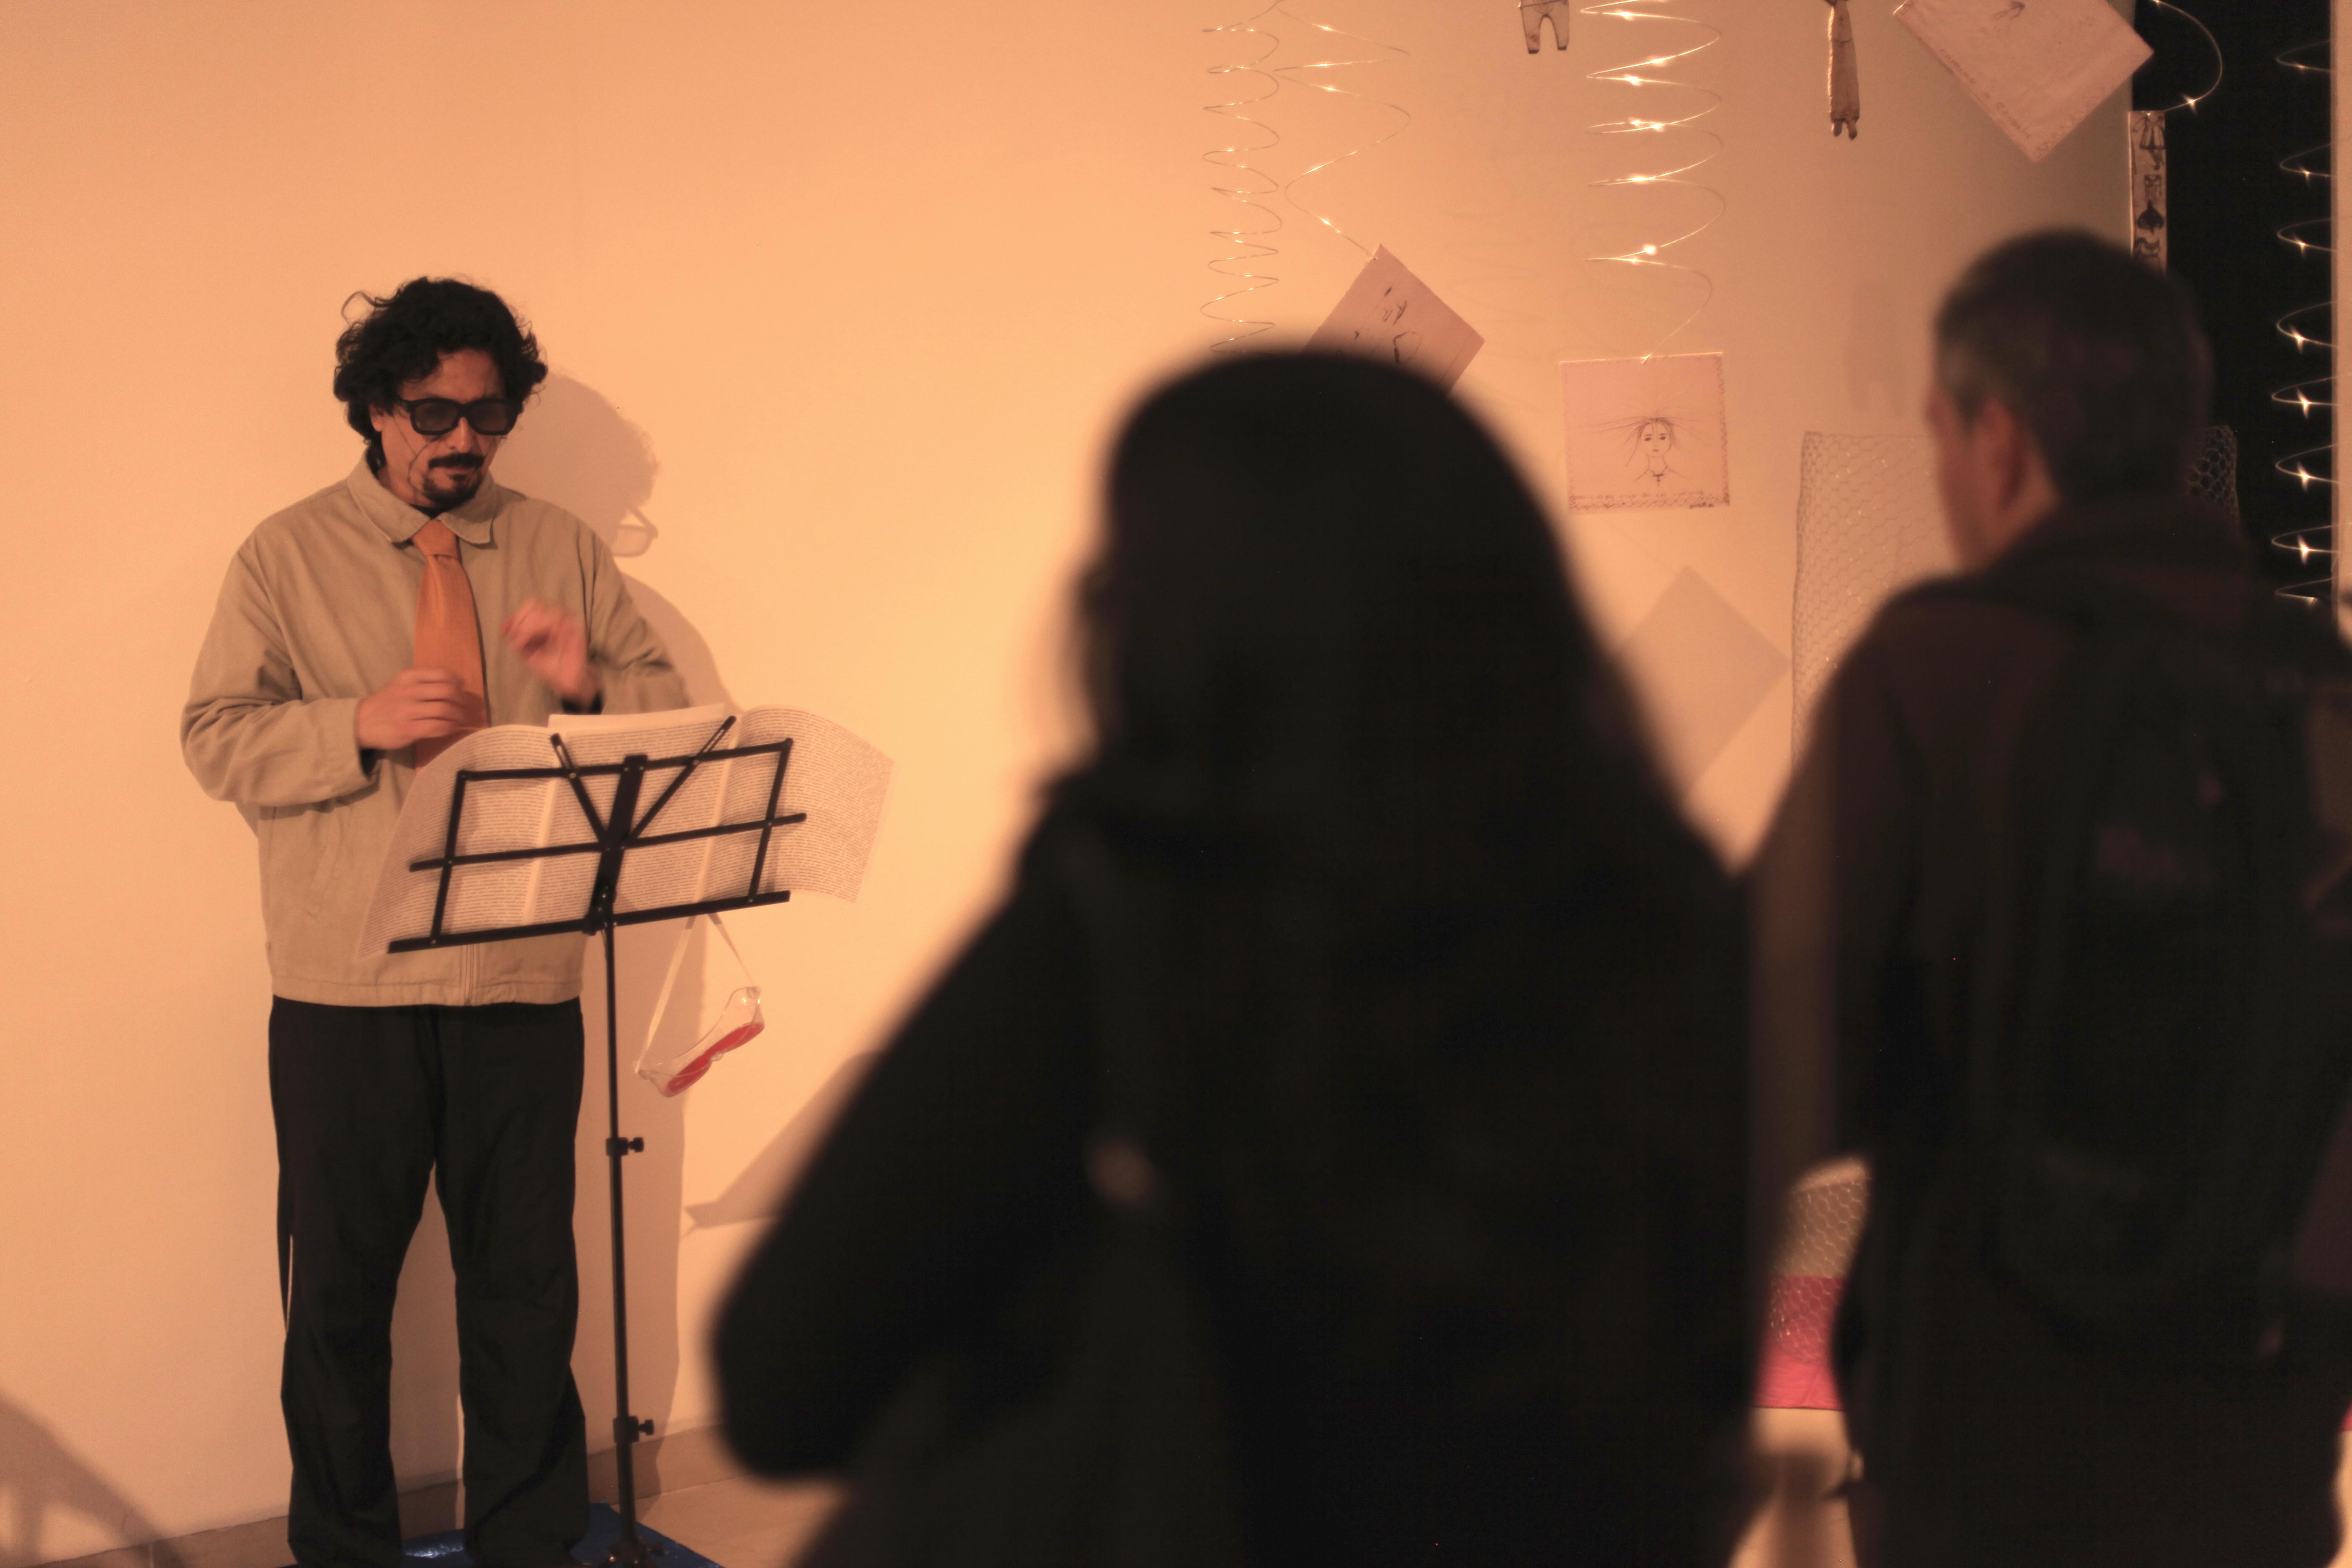 2014-10-29-diego-arteaga-05